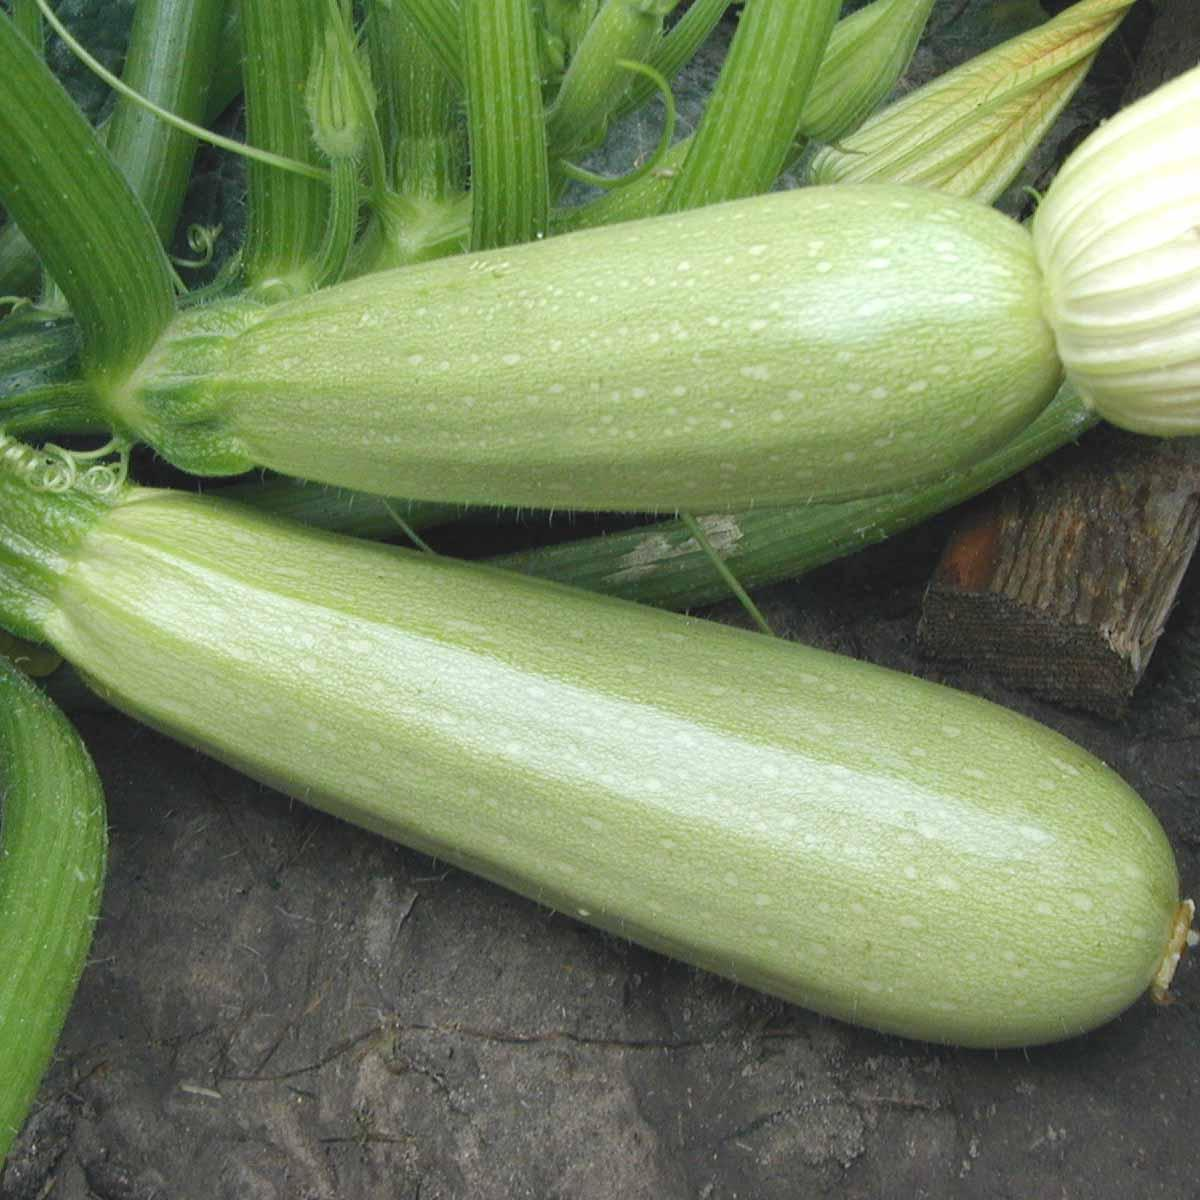 Семена кабачка Каризма F1 \ Karisma F1 2500 семян Syngenta